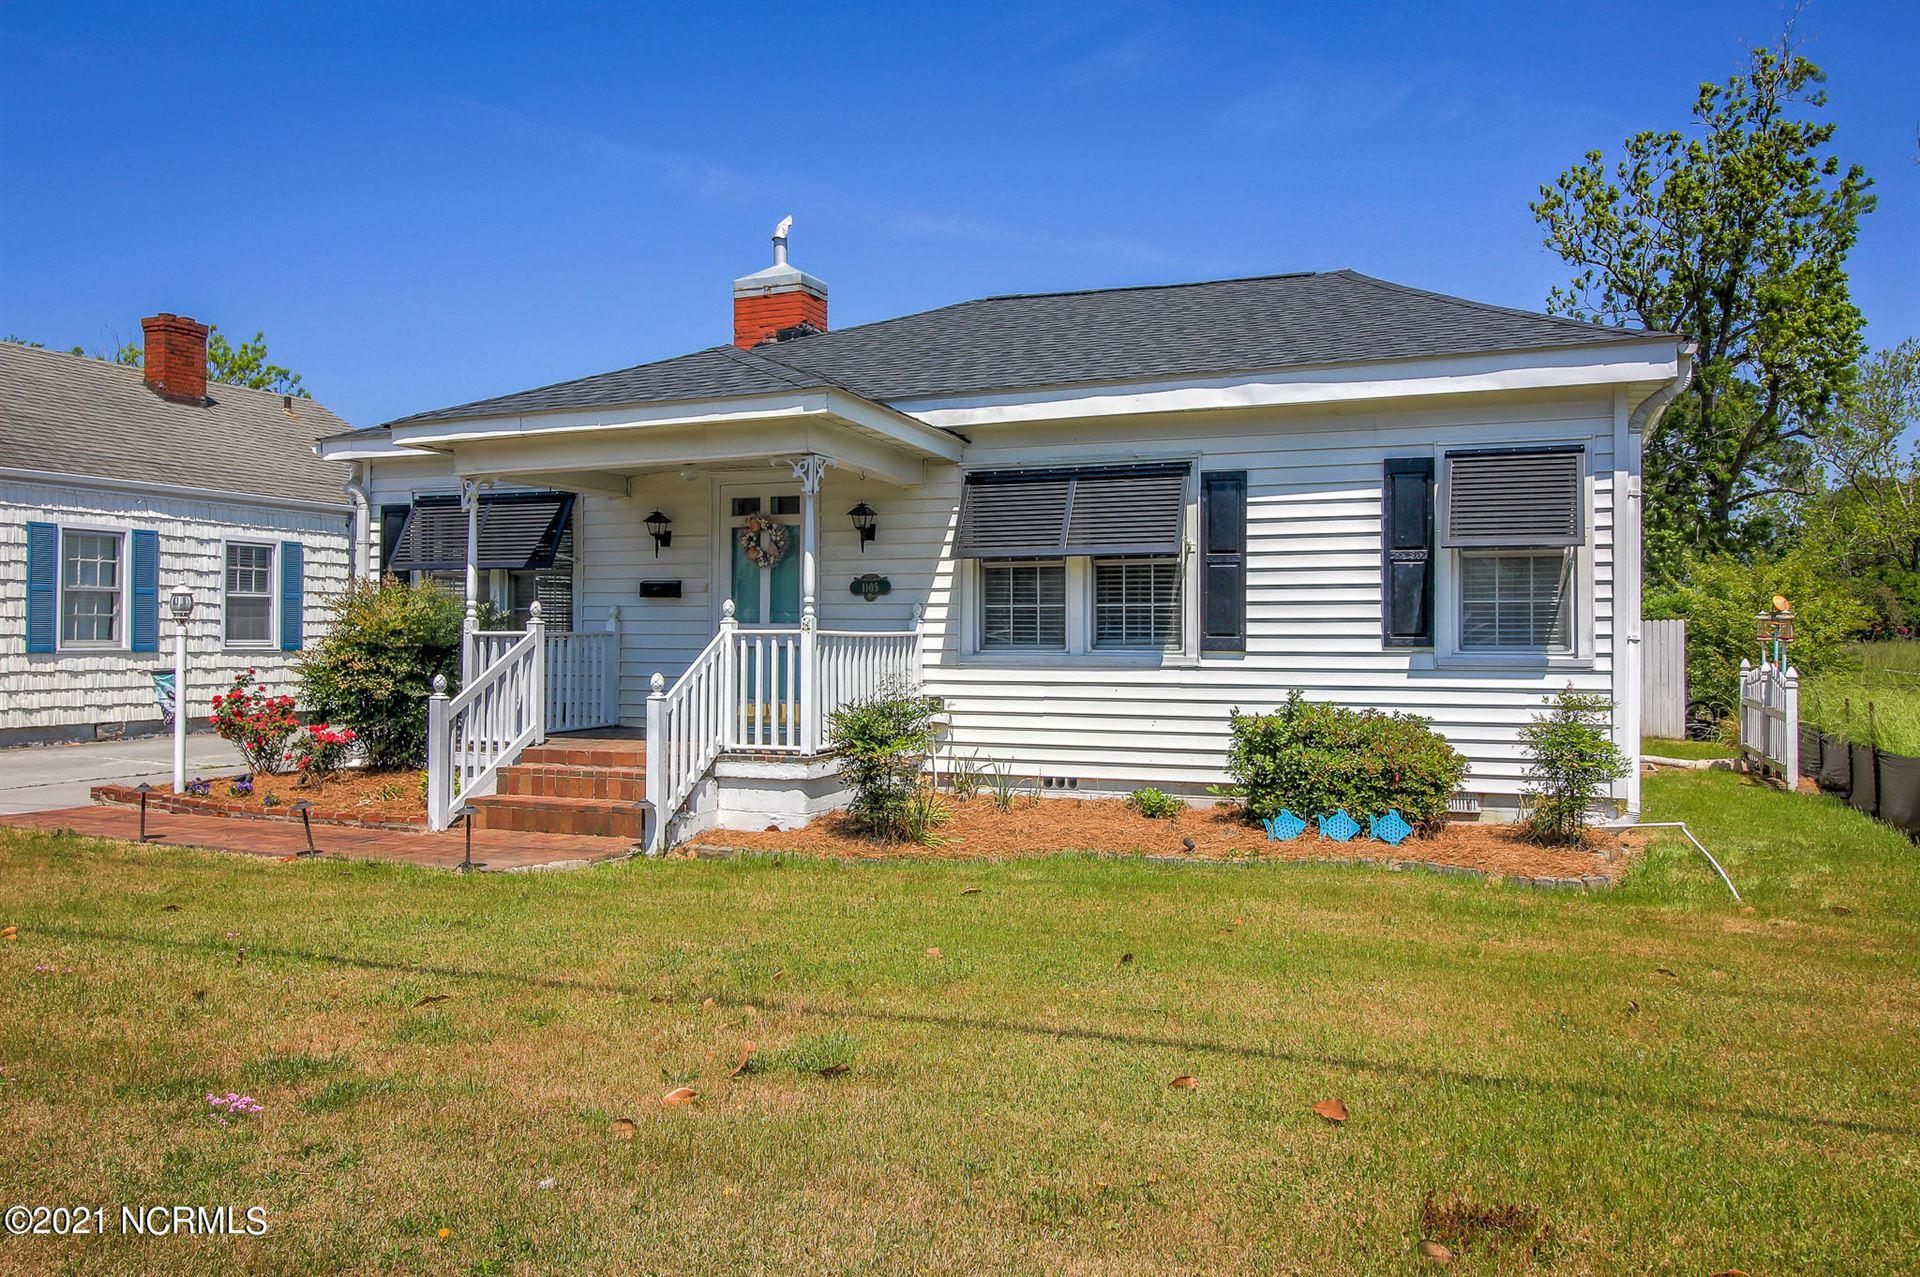 Photo of 1105 Live Oak Street, Beaufort, NC 28516 (MLS # 100270006)